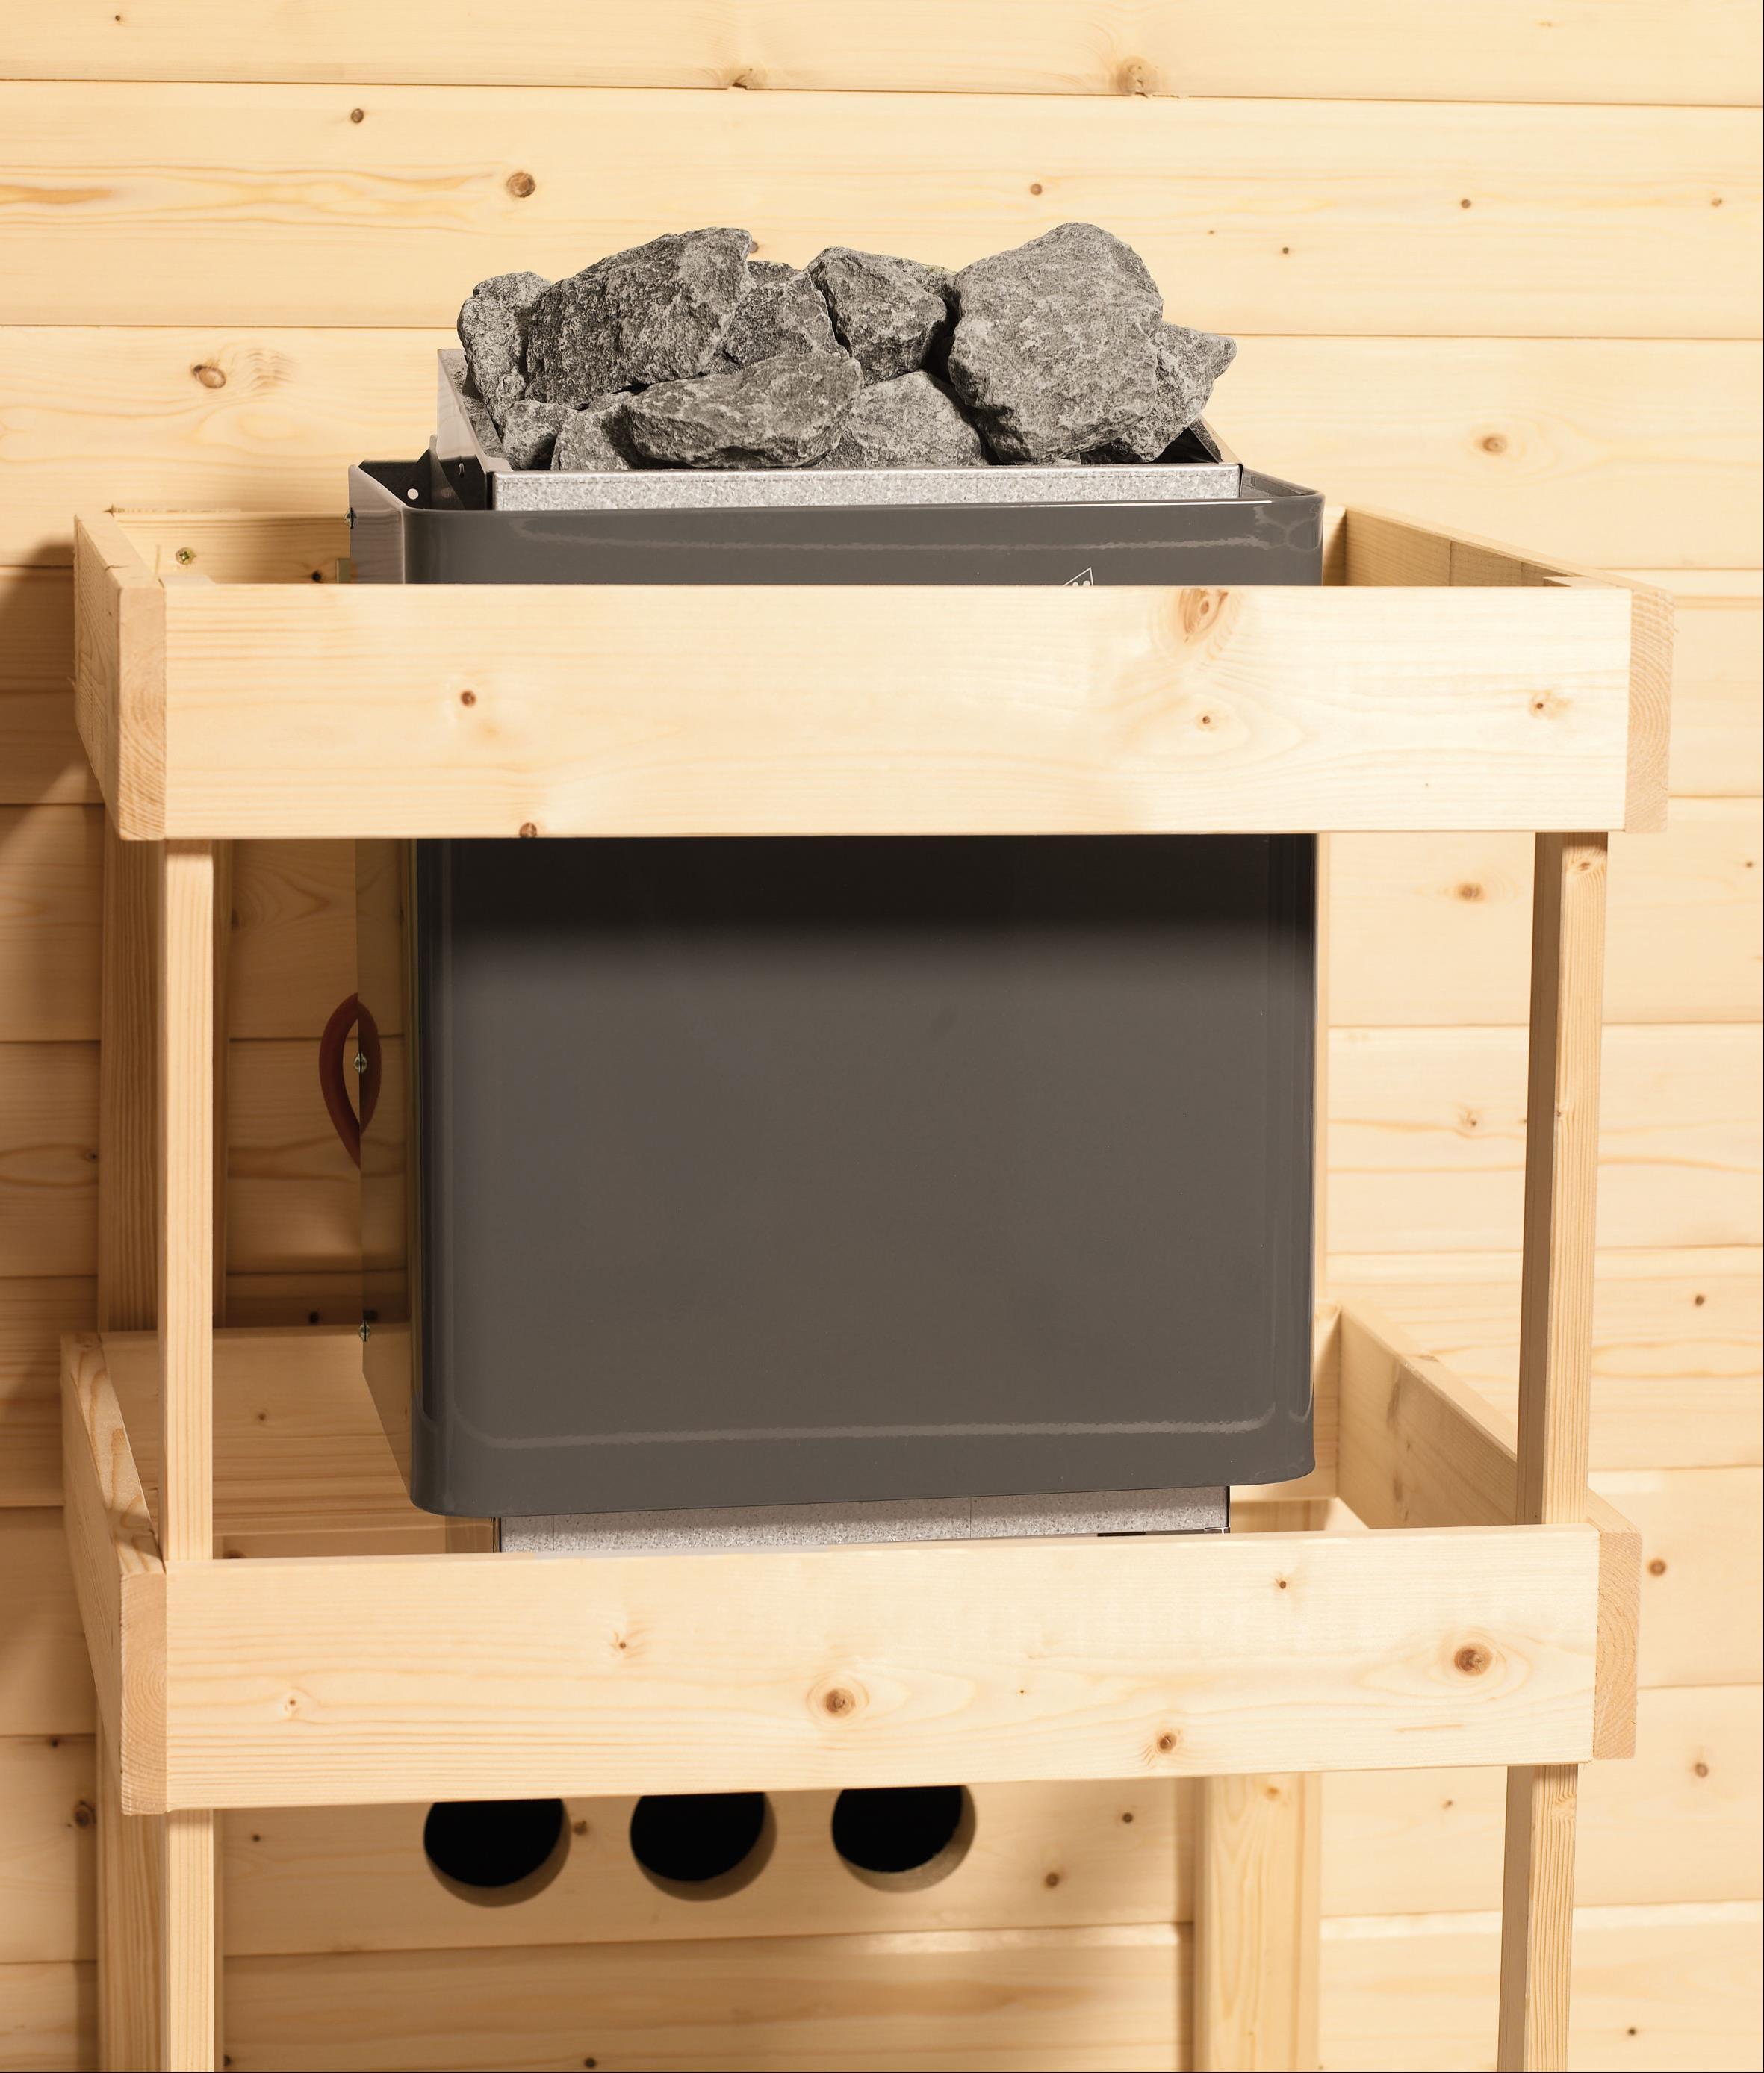 Woodfeeling Sauna Leona 38mm Ofen 9kW intern Tür Klarglas Bild 8